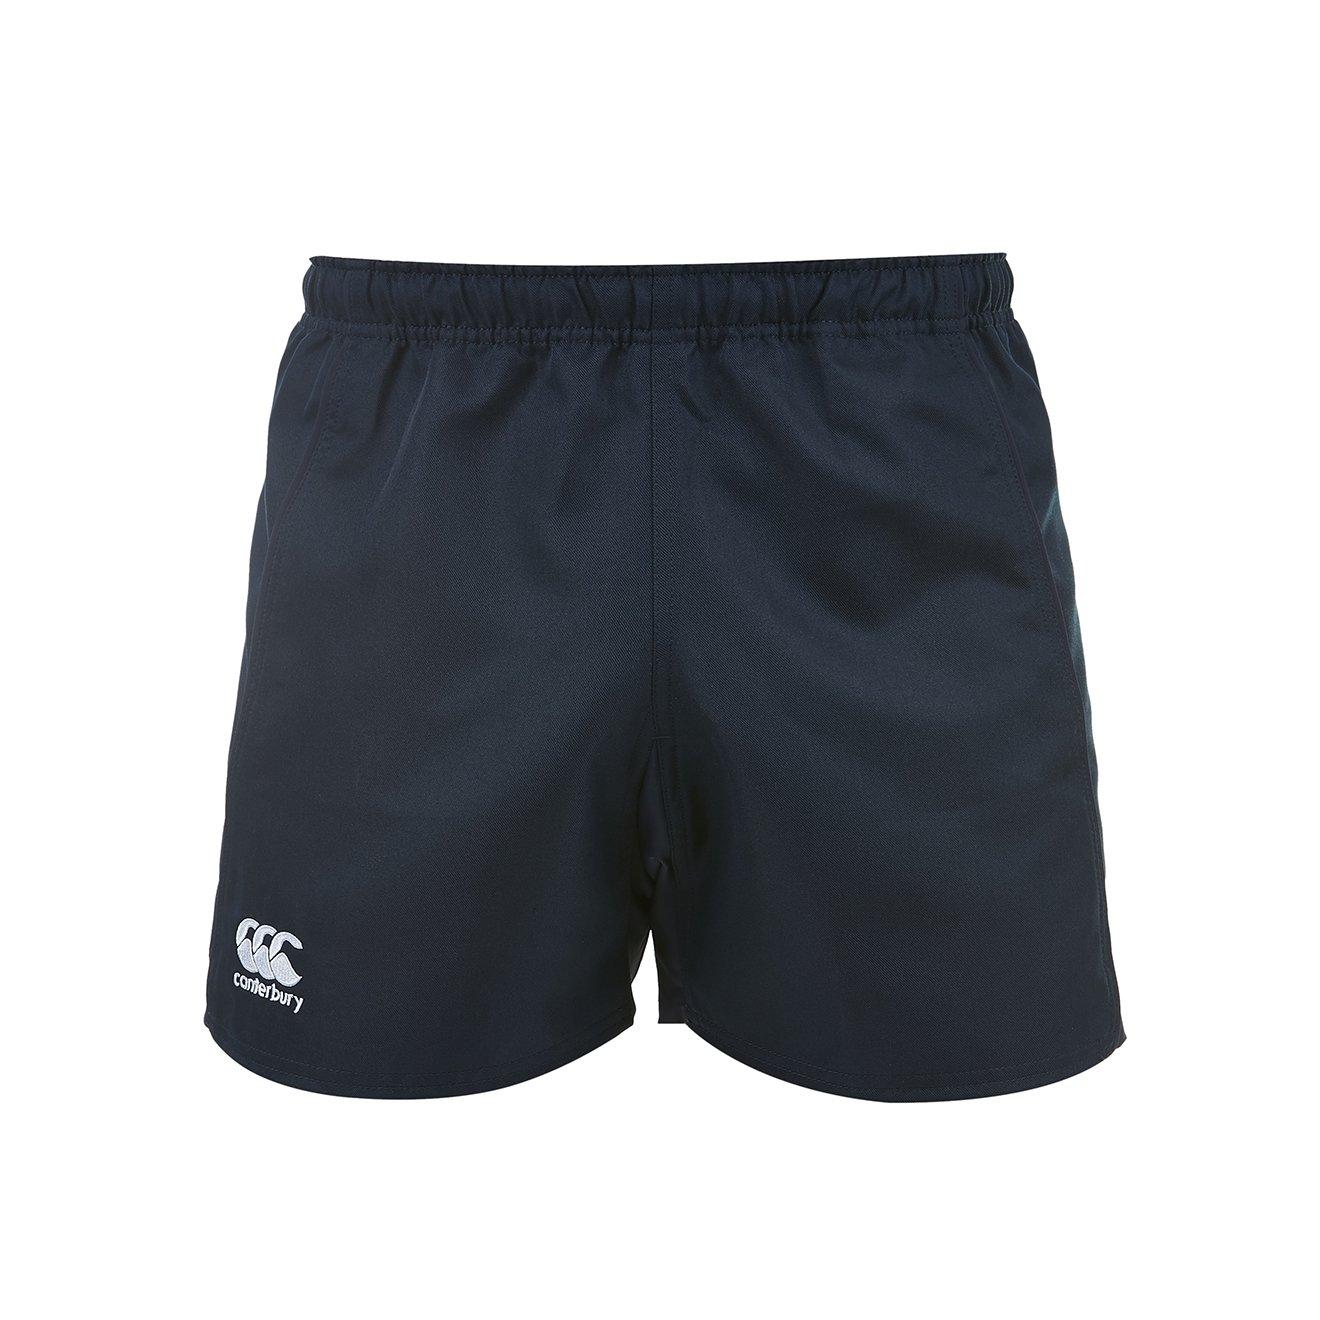 TALLA 4XL. Canterbury Advantage Pantalones Cortos, Hombre